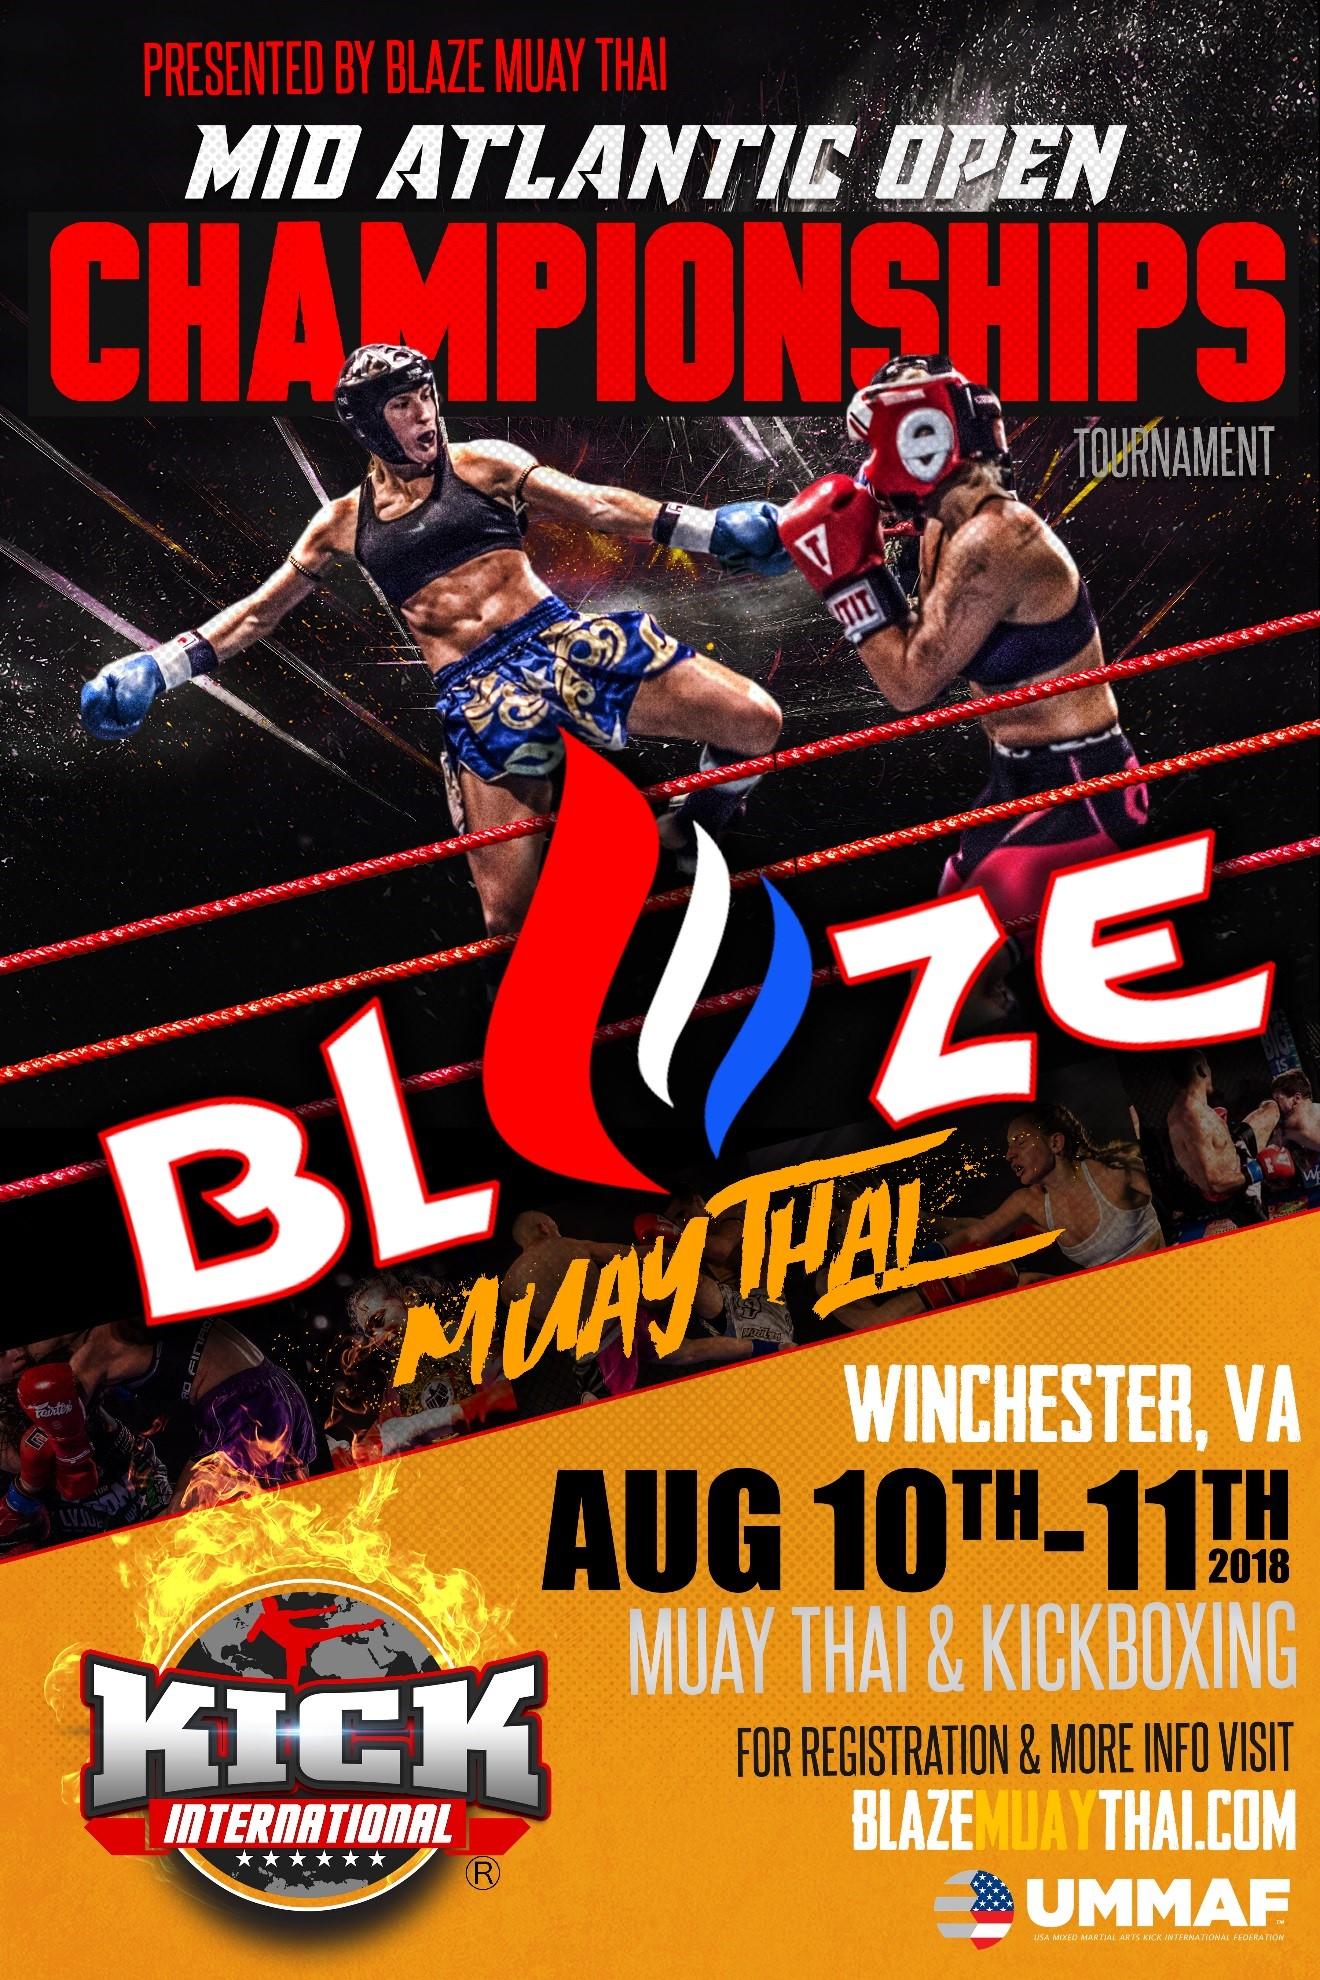 Mid-Atlantic Kickboxing News